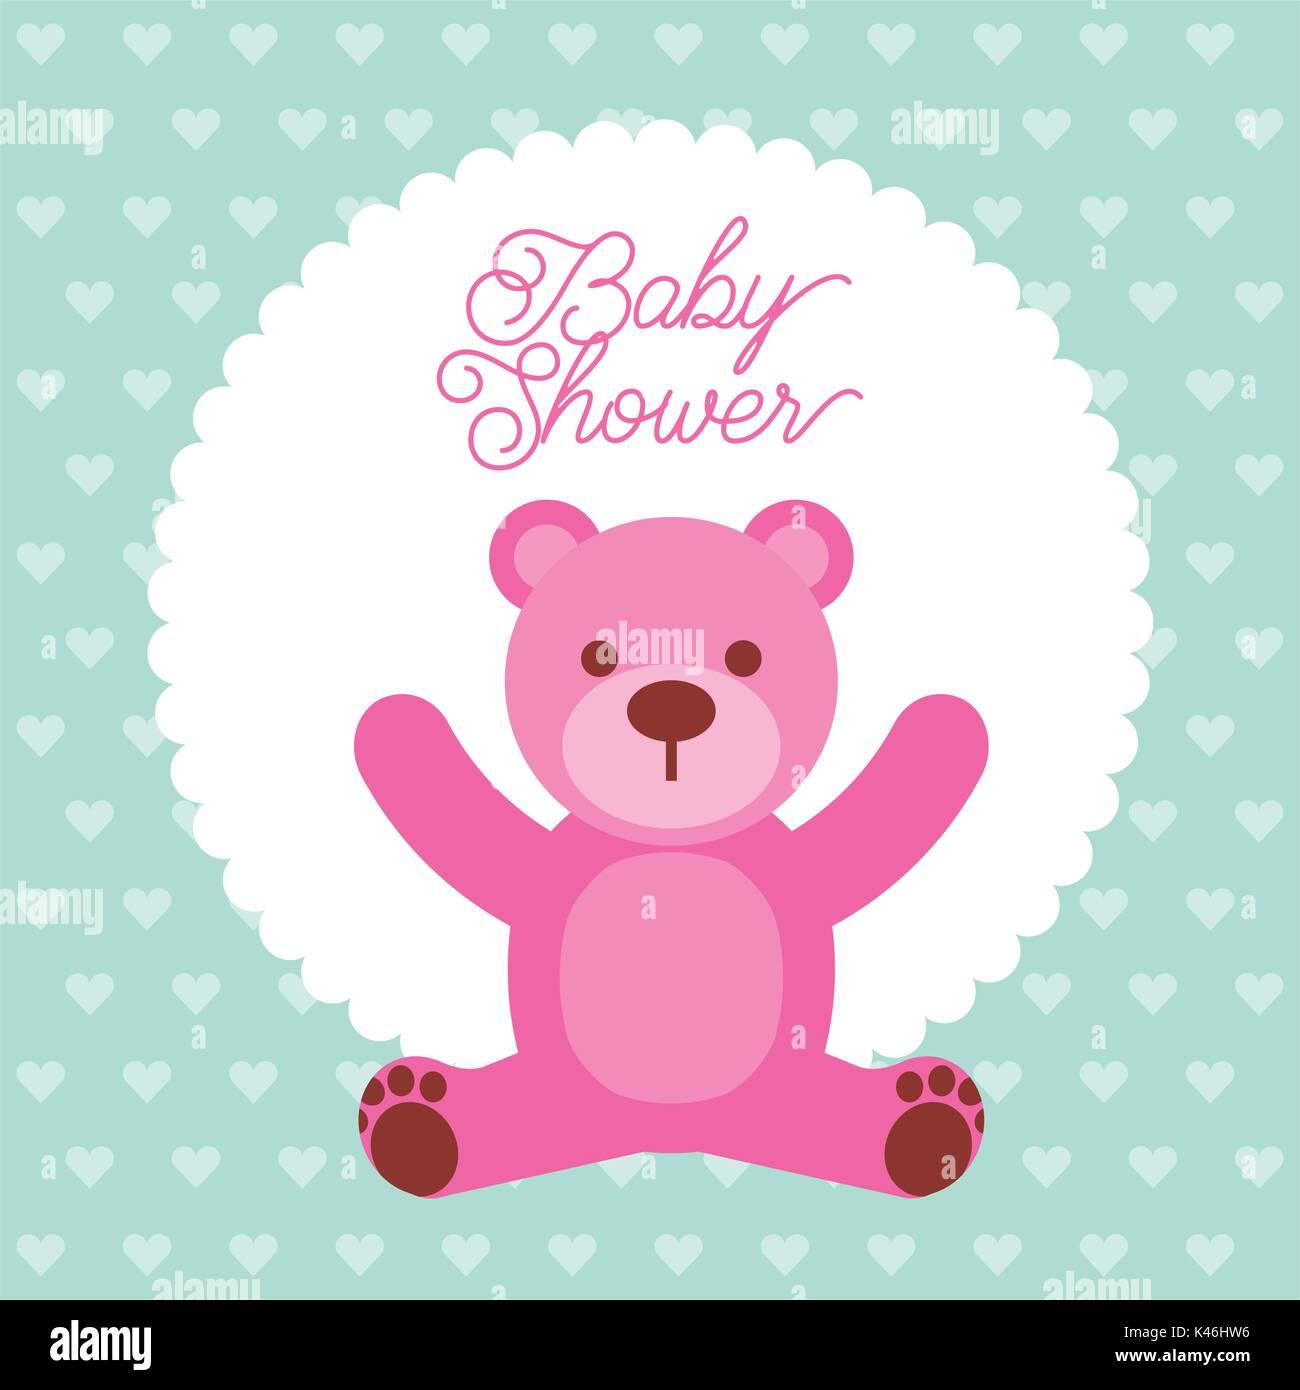 baby shower pink teddy bear card invitation stock vector art